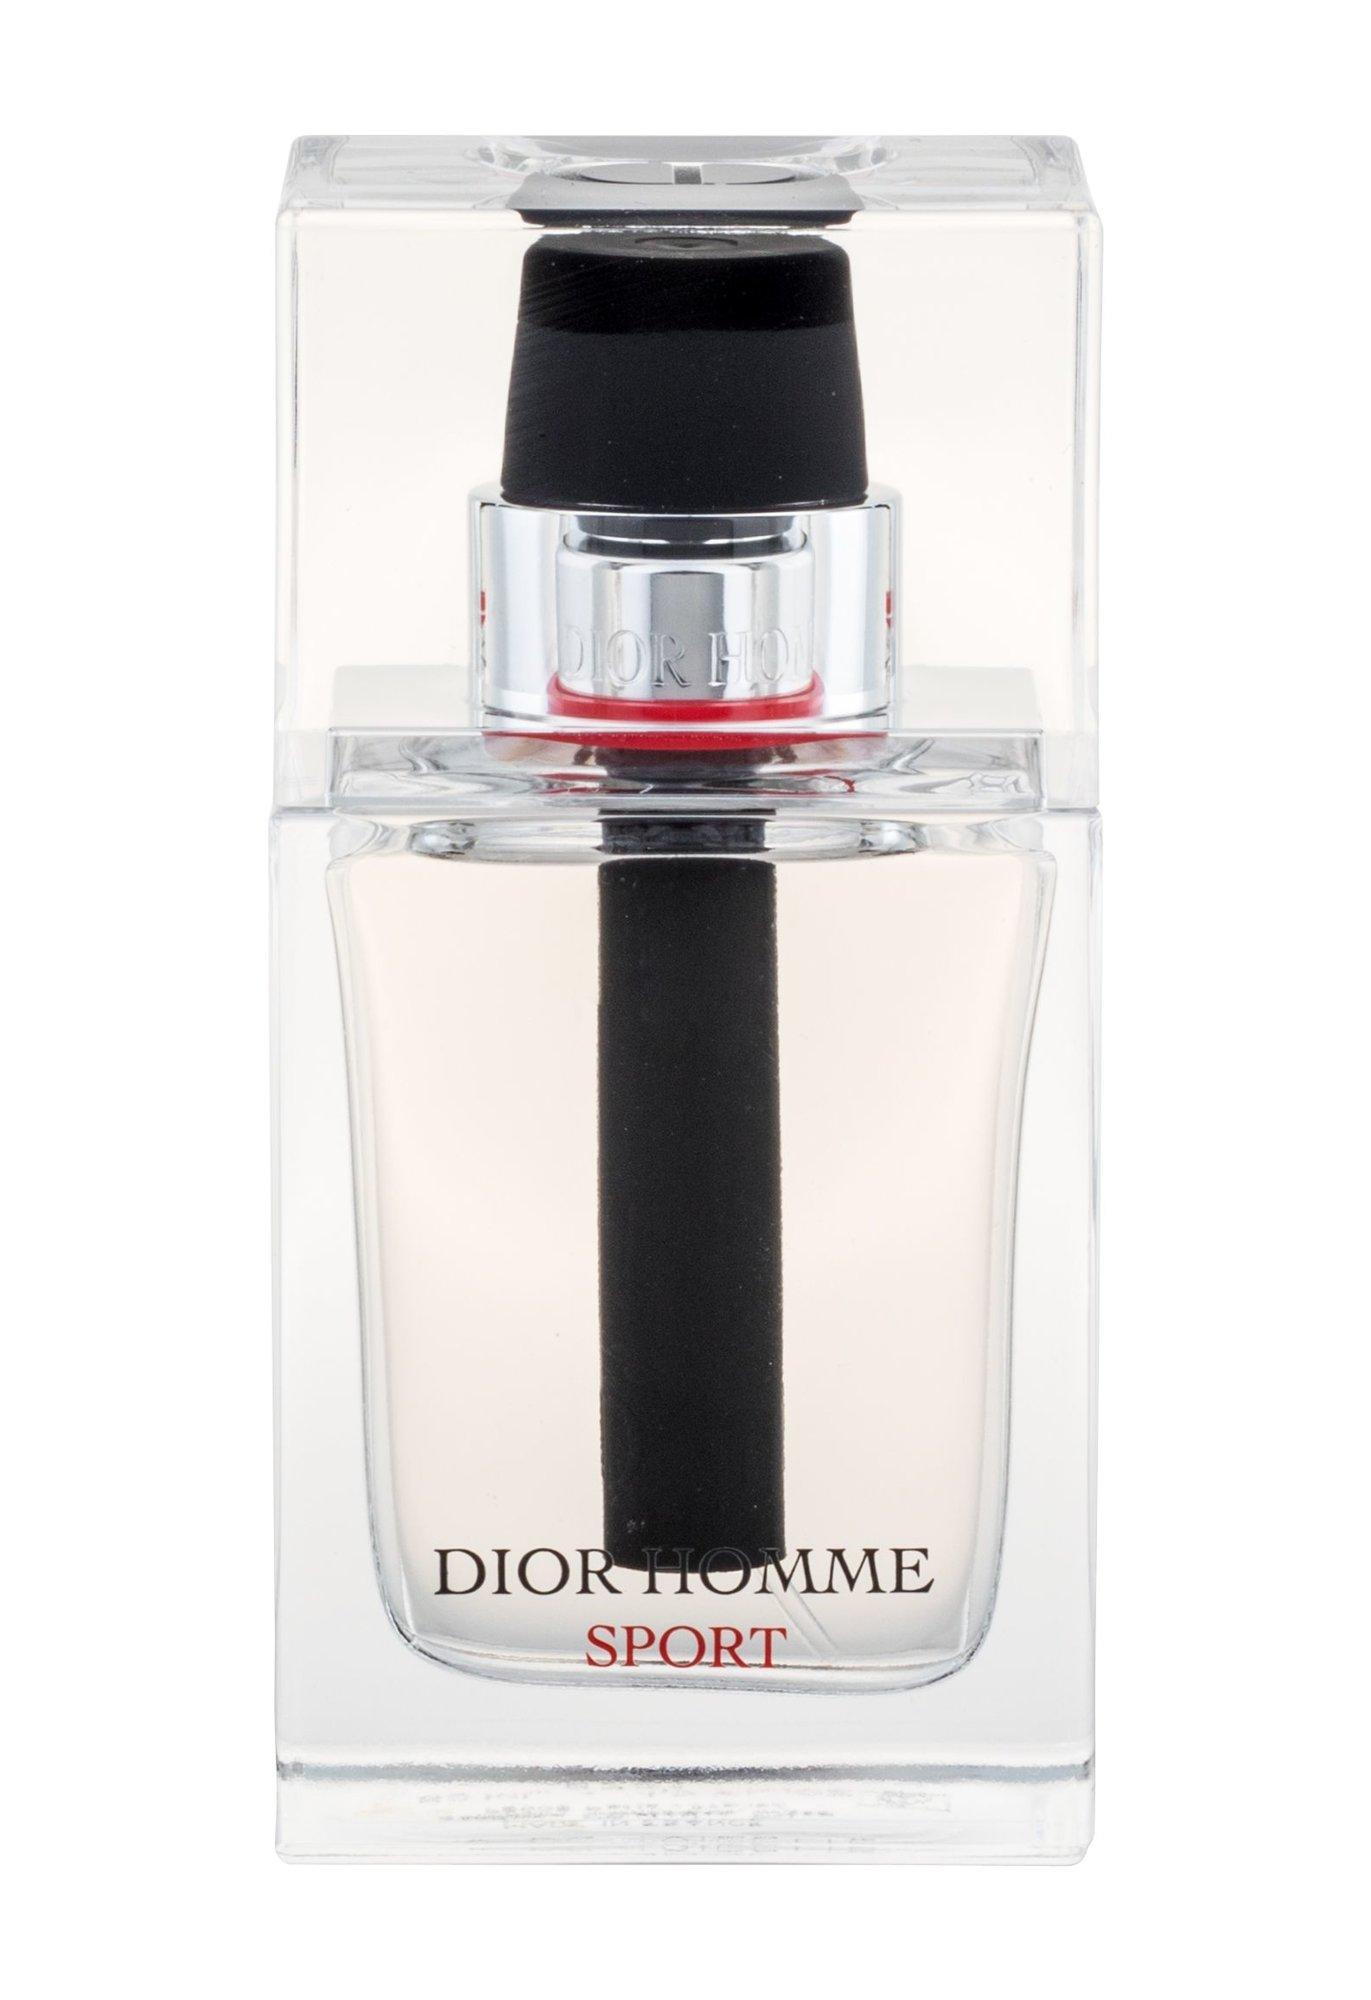 Christian Dior Dior Homme Sport EDT 50ml